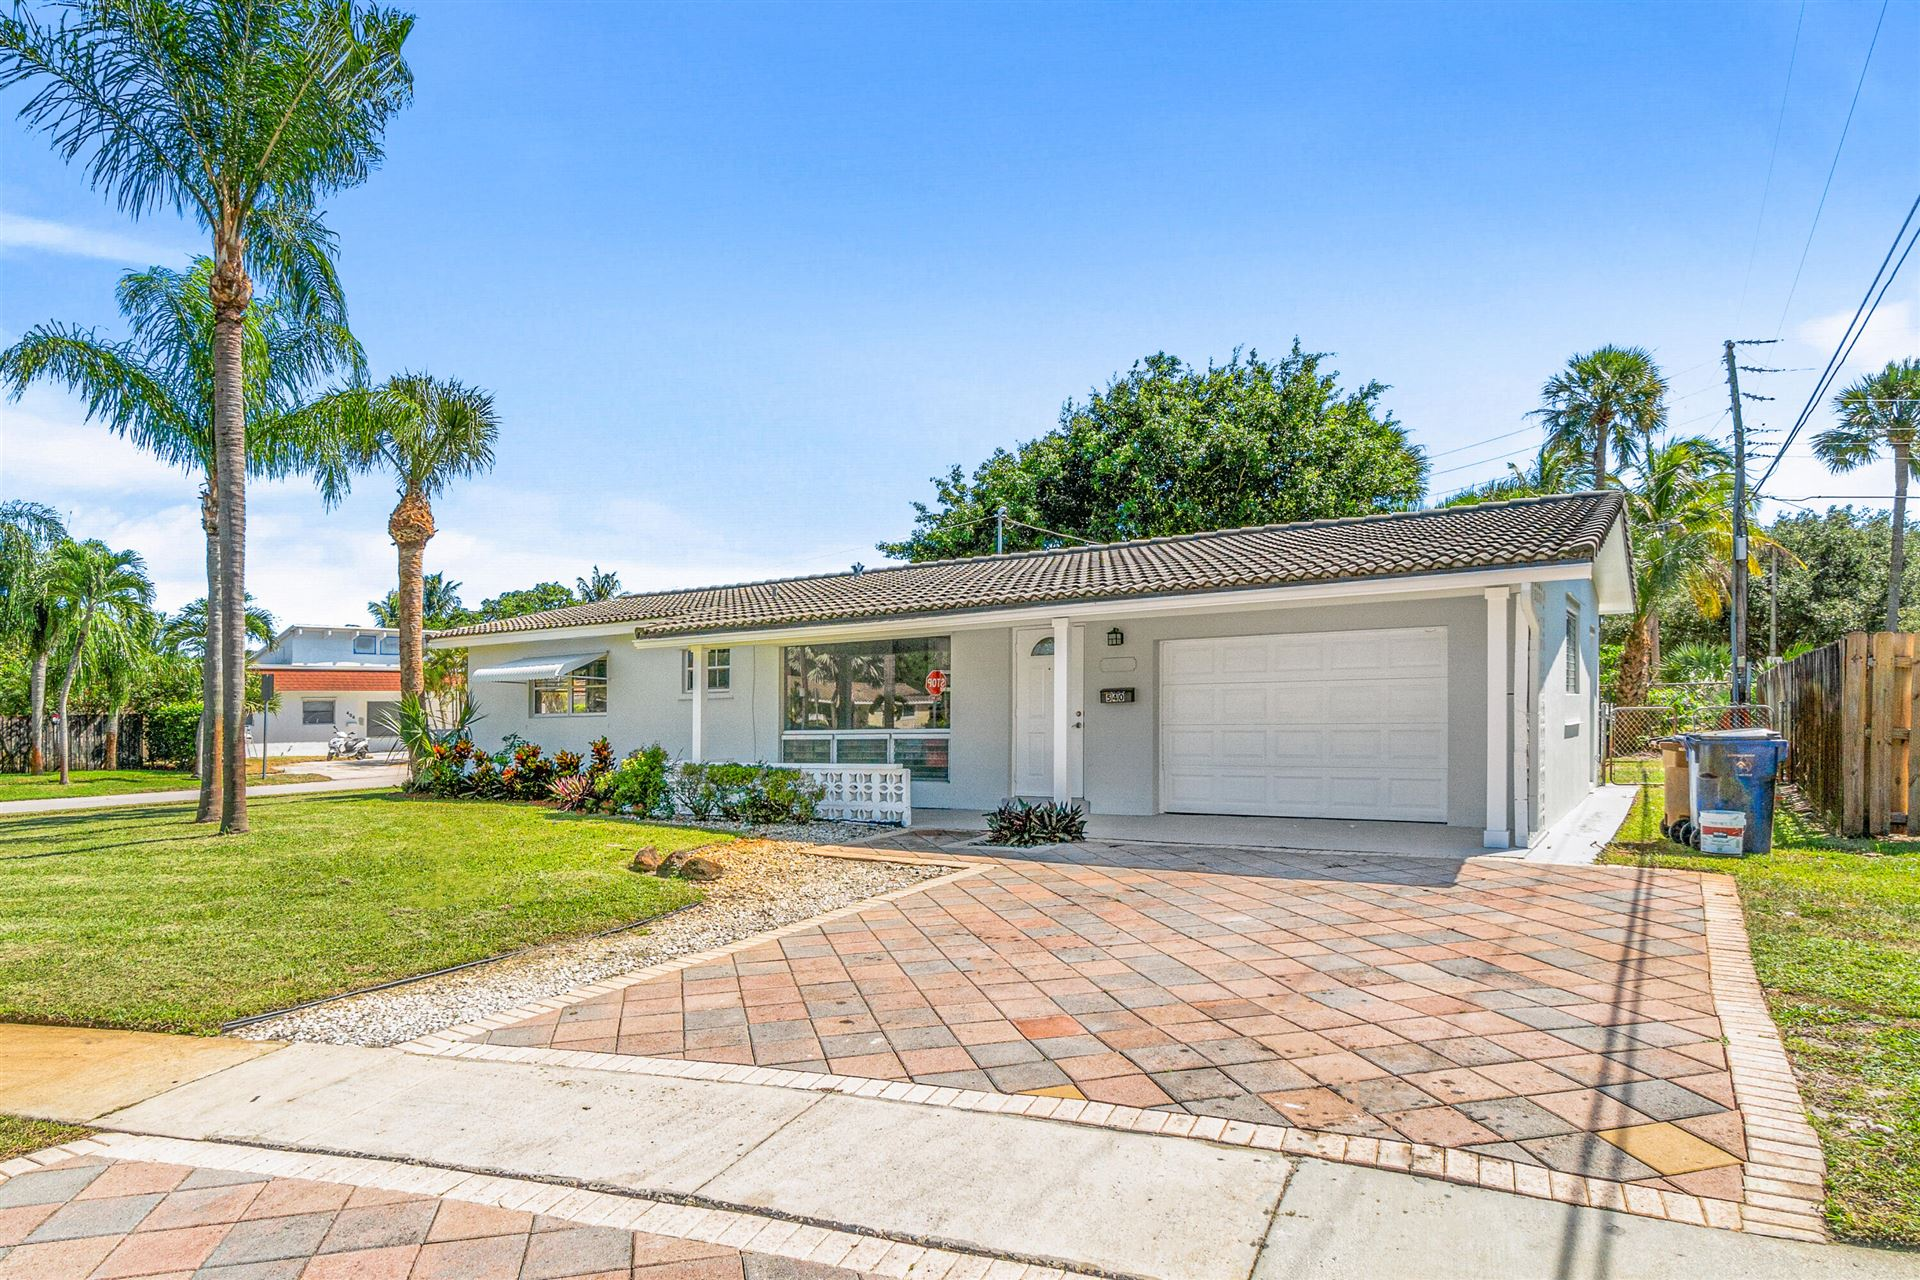 Photo of 540 SE 4 Street, Deerfield Beach, FL 33441 (MLS # RX-10750834)